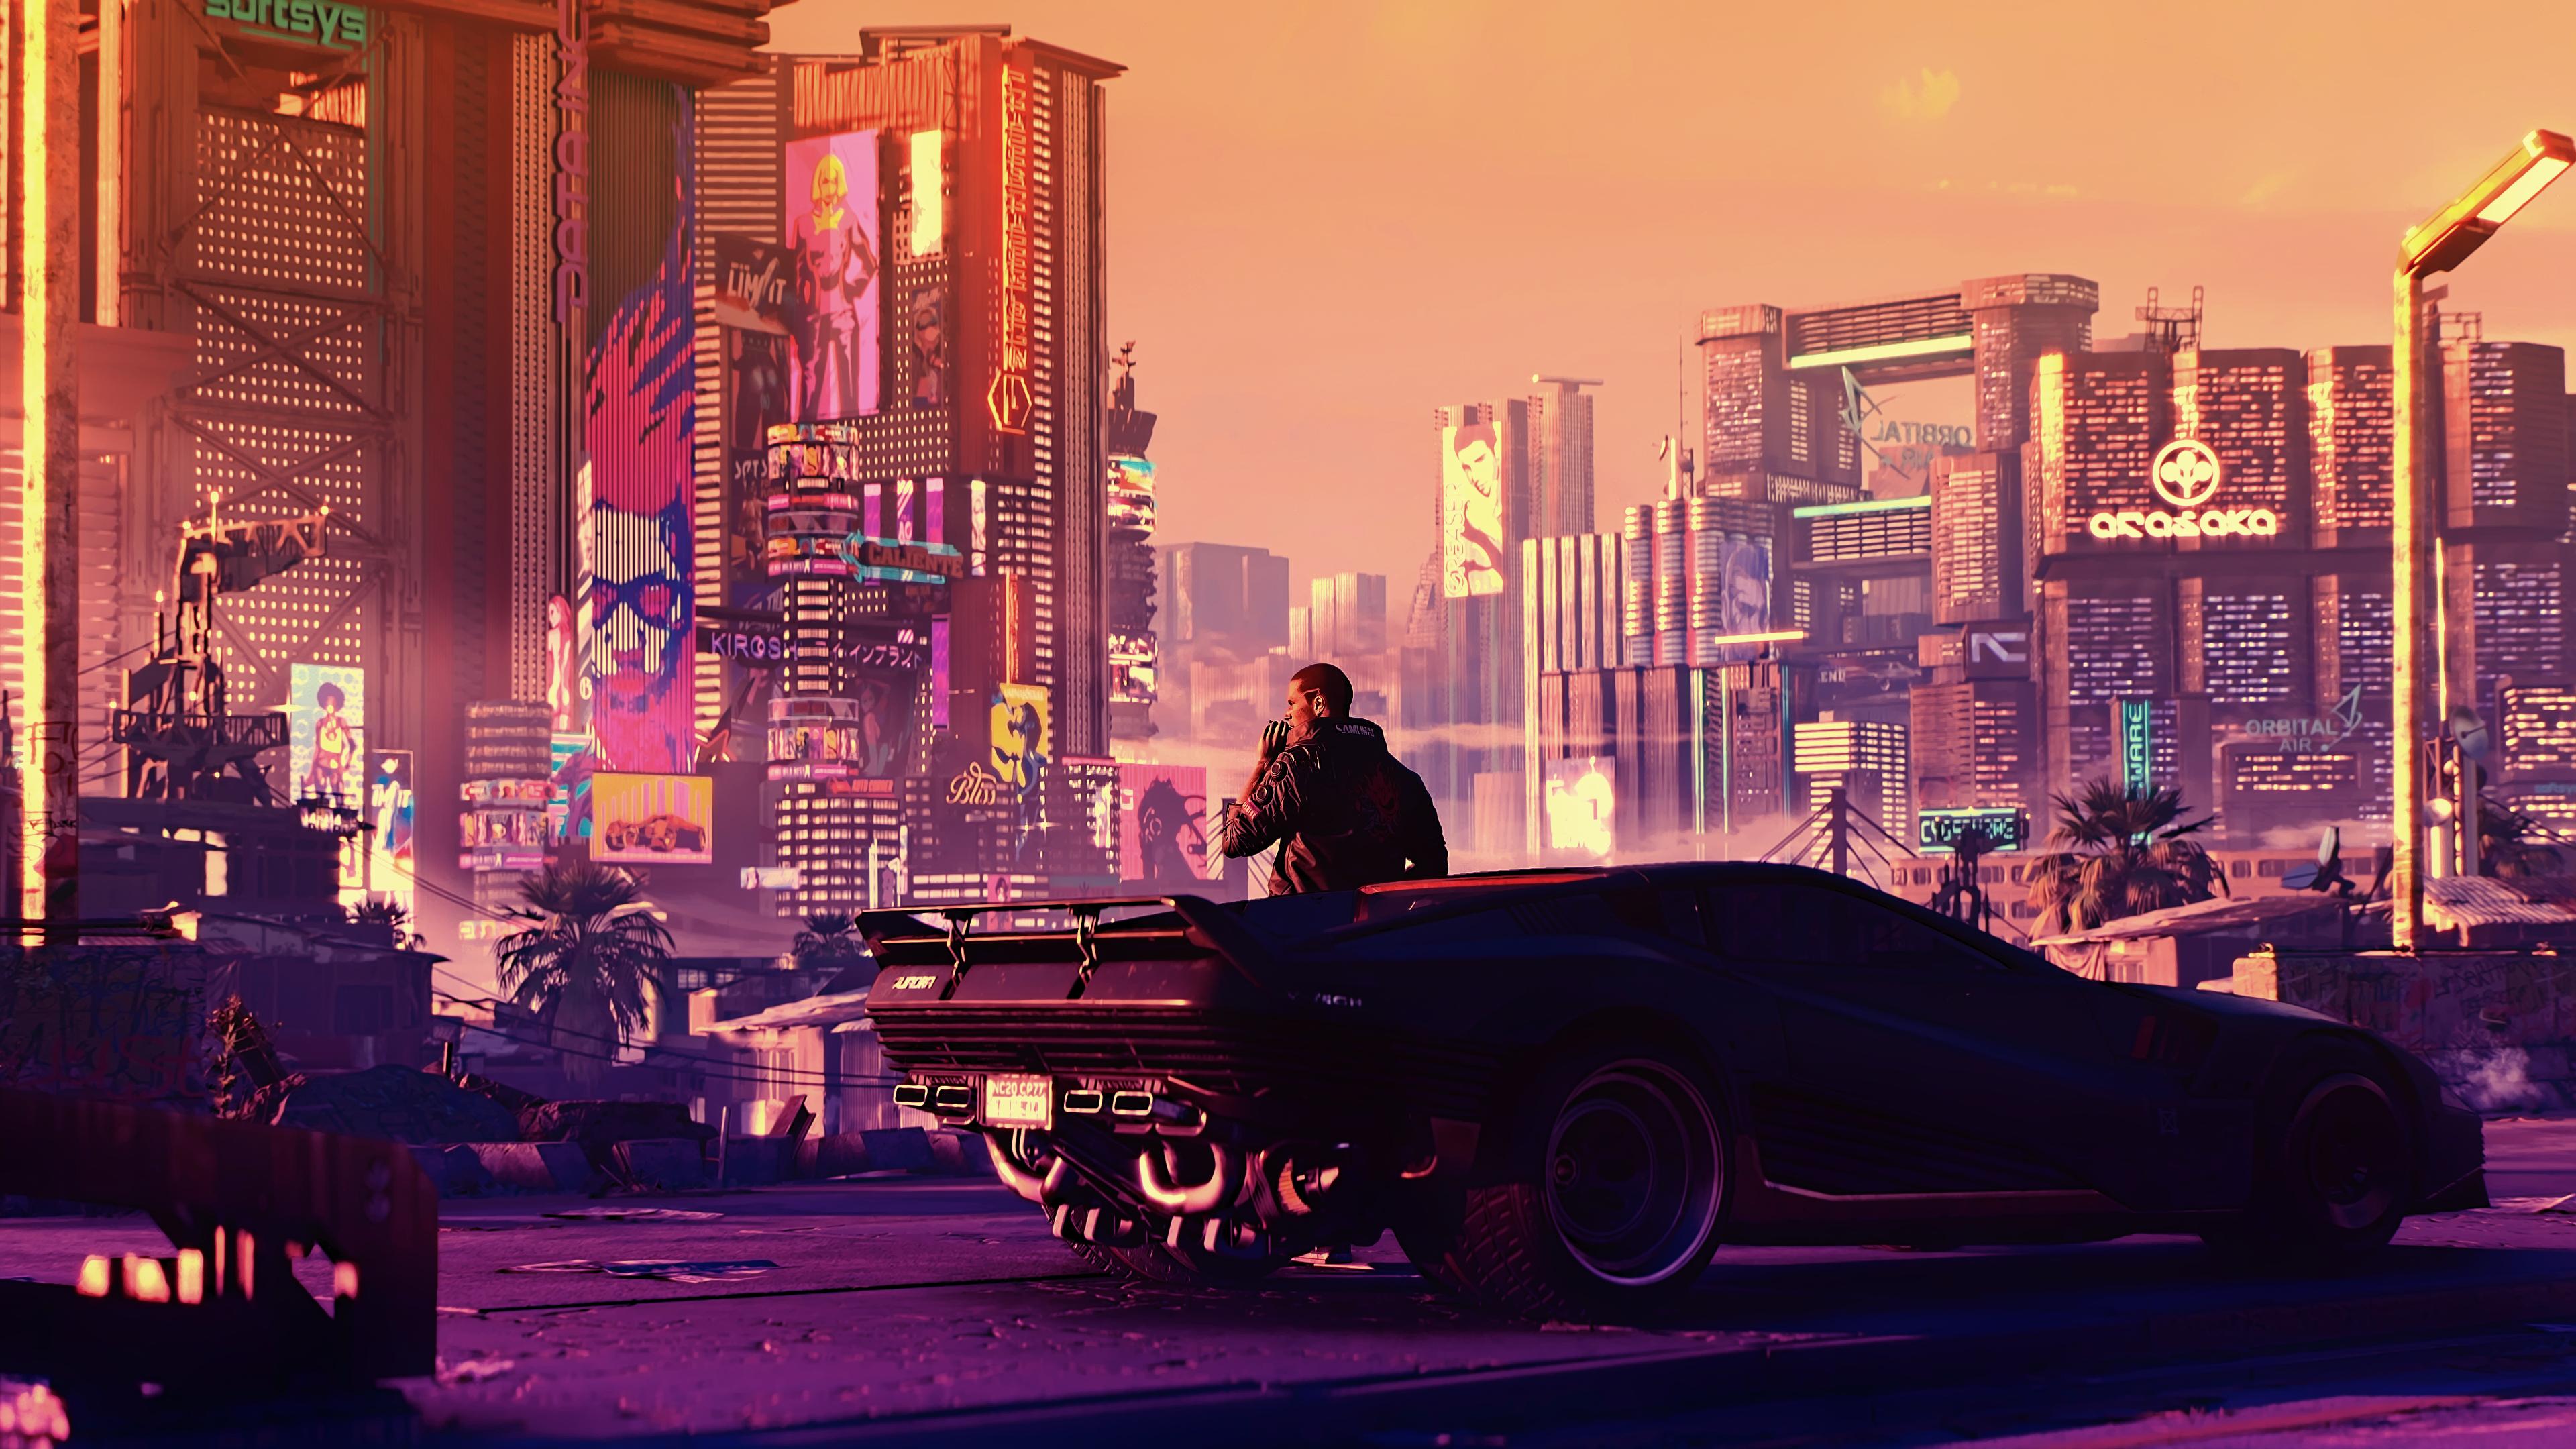 General 3840x2160 cyber science fiction digital art concept art cyberpunk artwork futuristic fantasy art fan art 3D PC gaming CGI sunset futuristic city cityscape Cyberpunk 2077 city